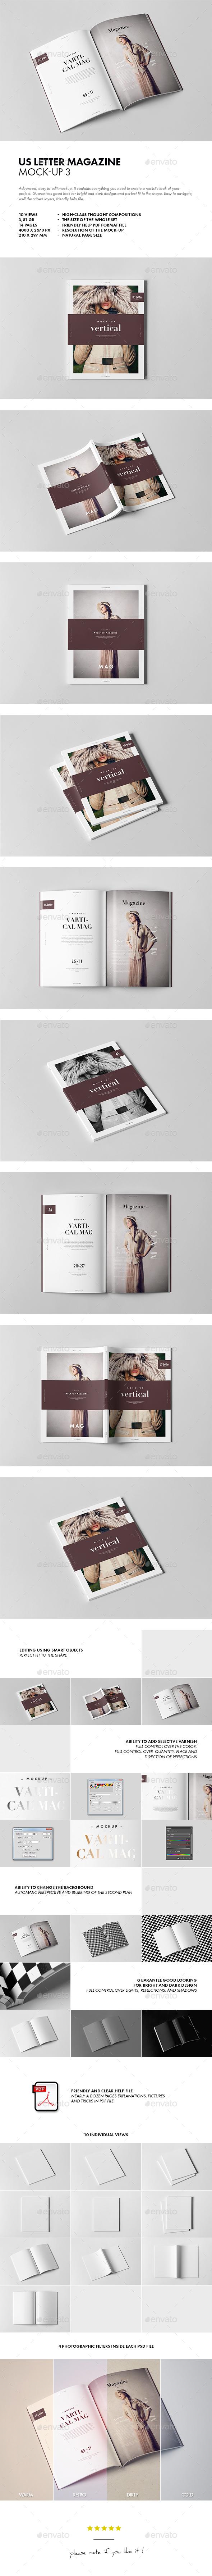 GraphicRiver US Letter Magazine Mock-up 3 20489501